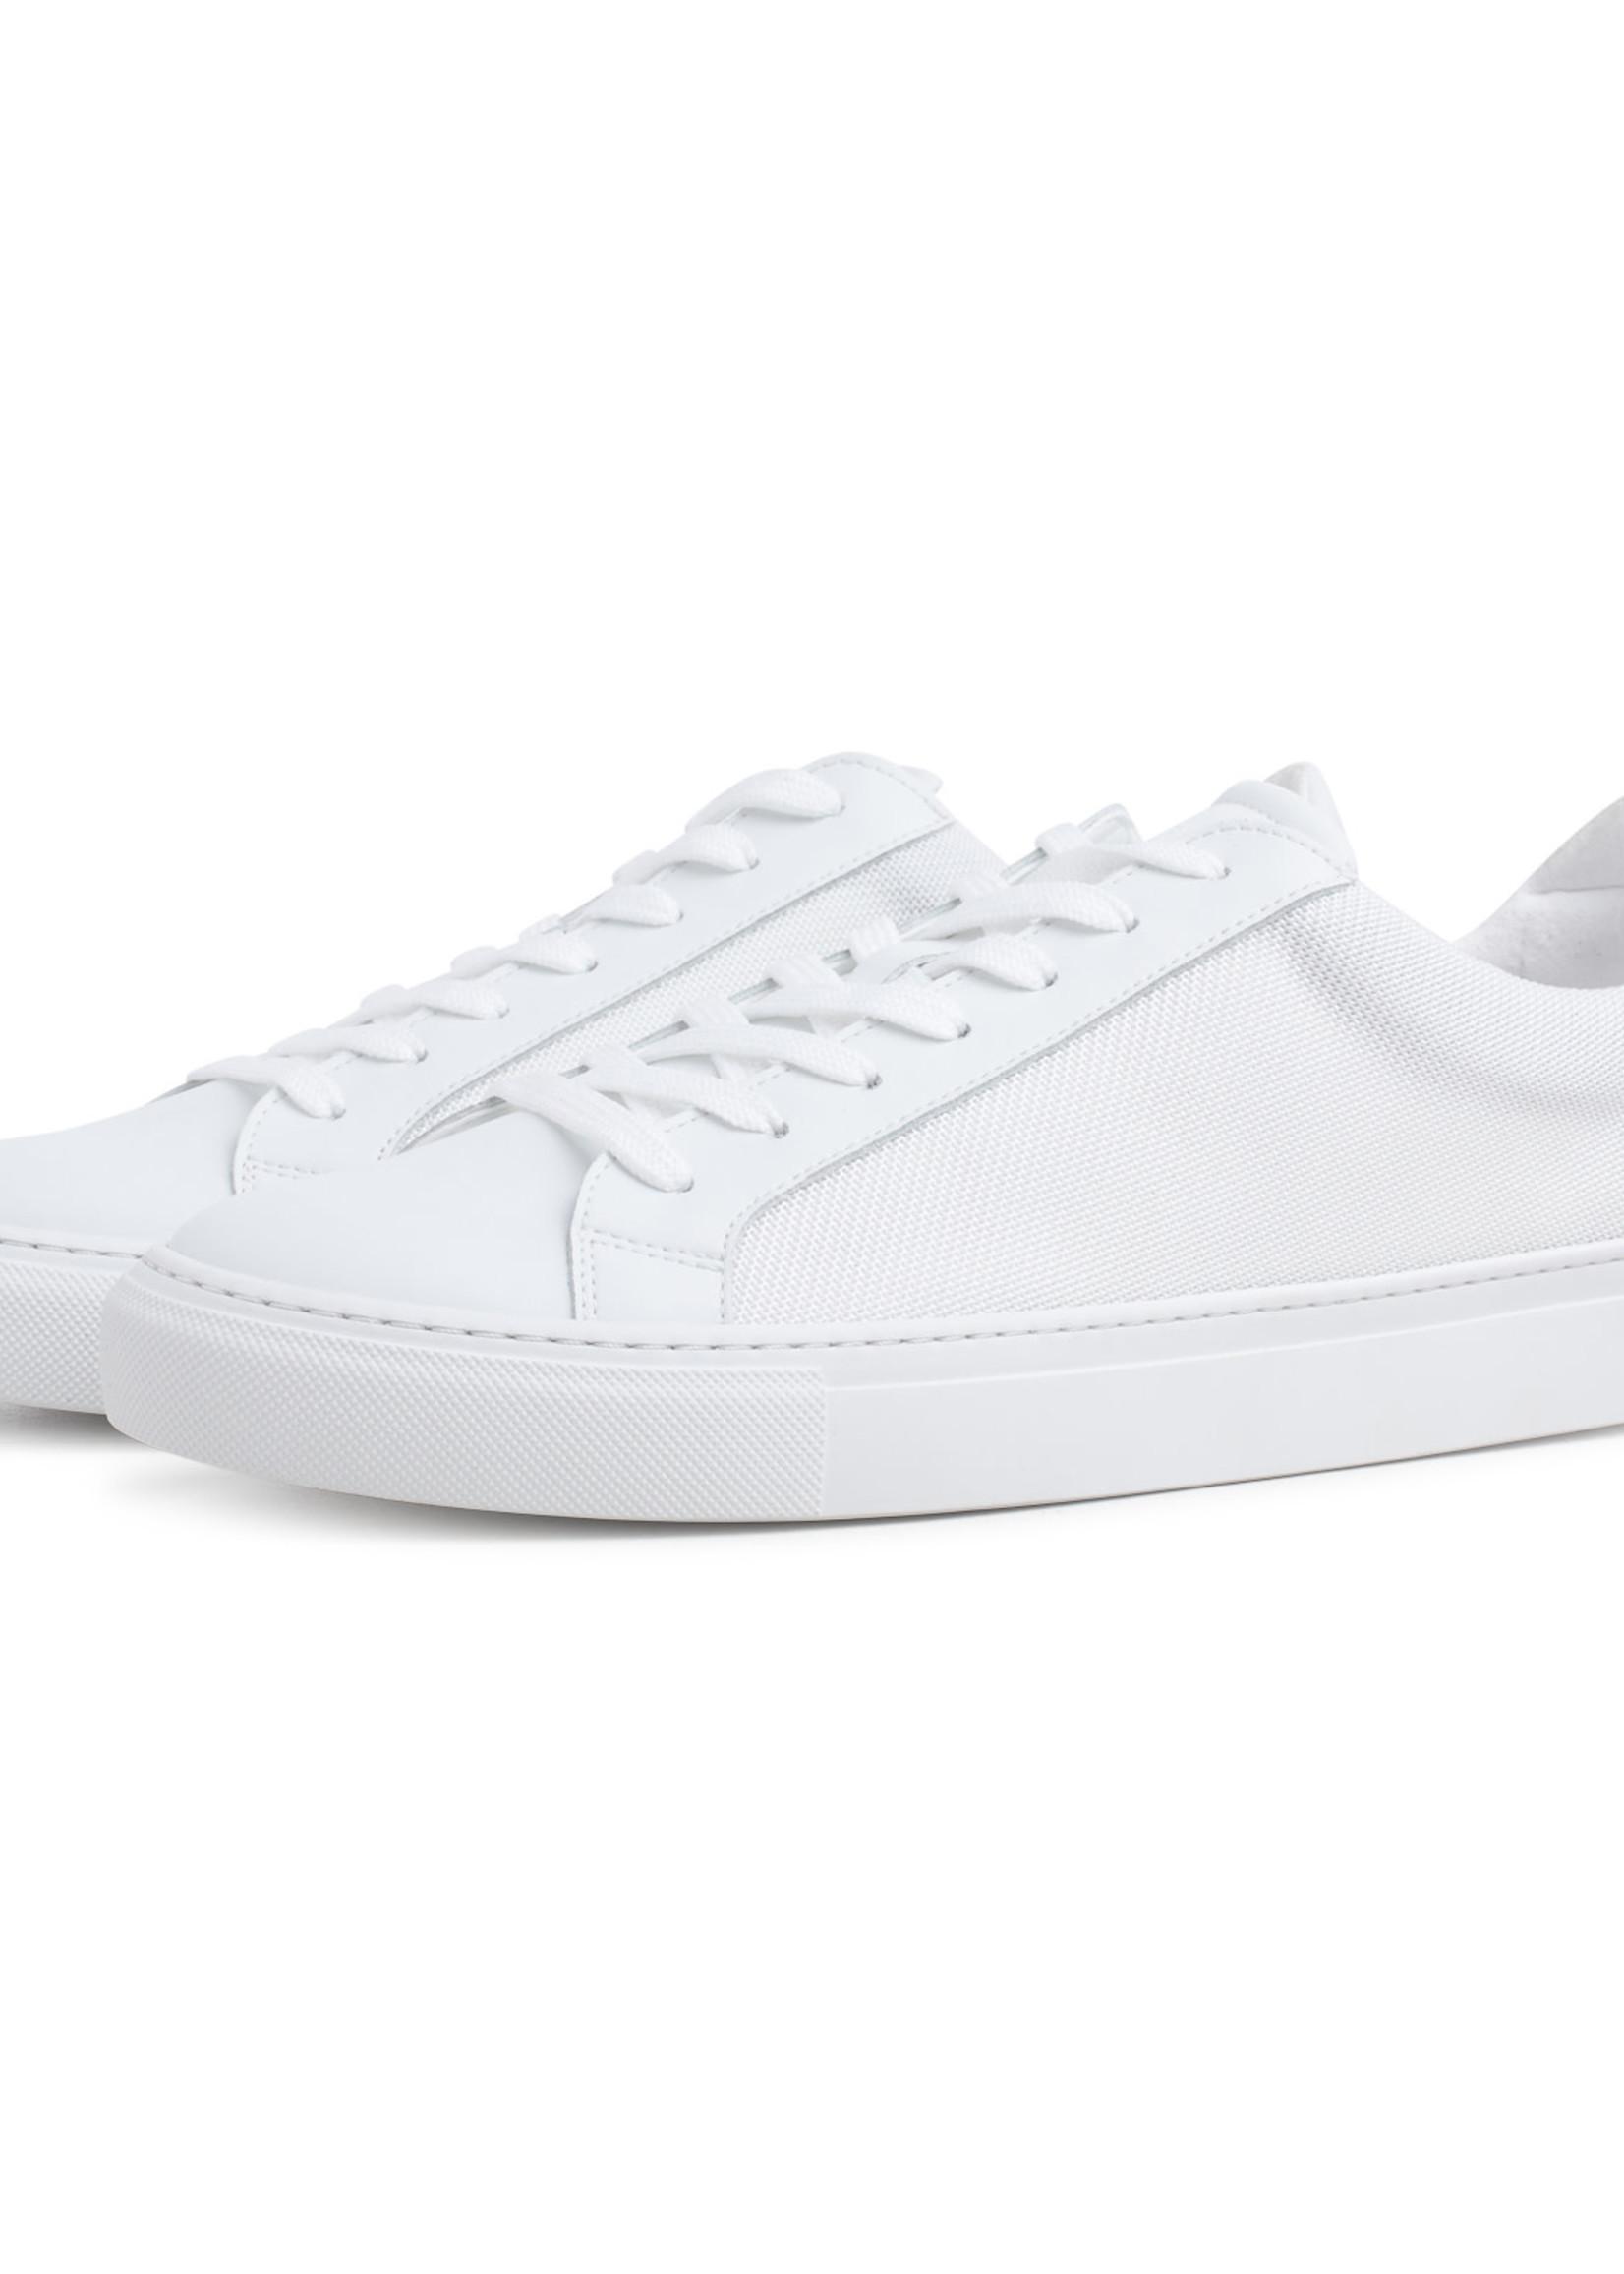 Garment Project Type Sneaker (White)